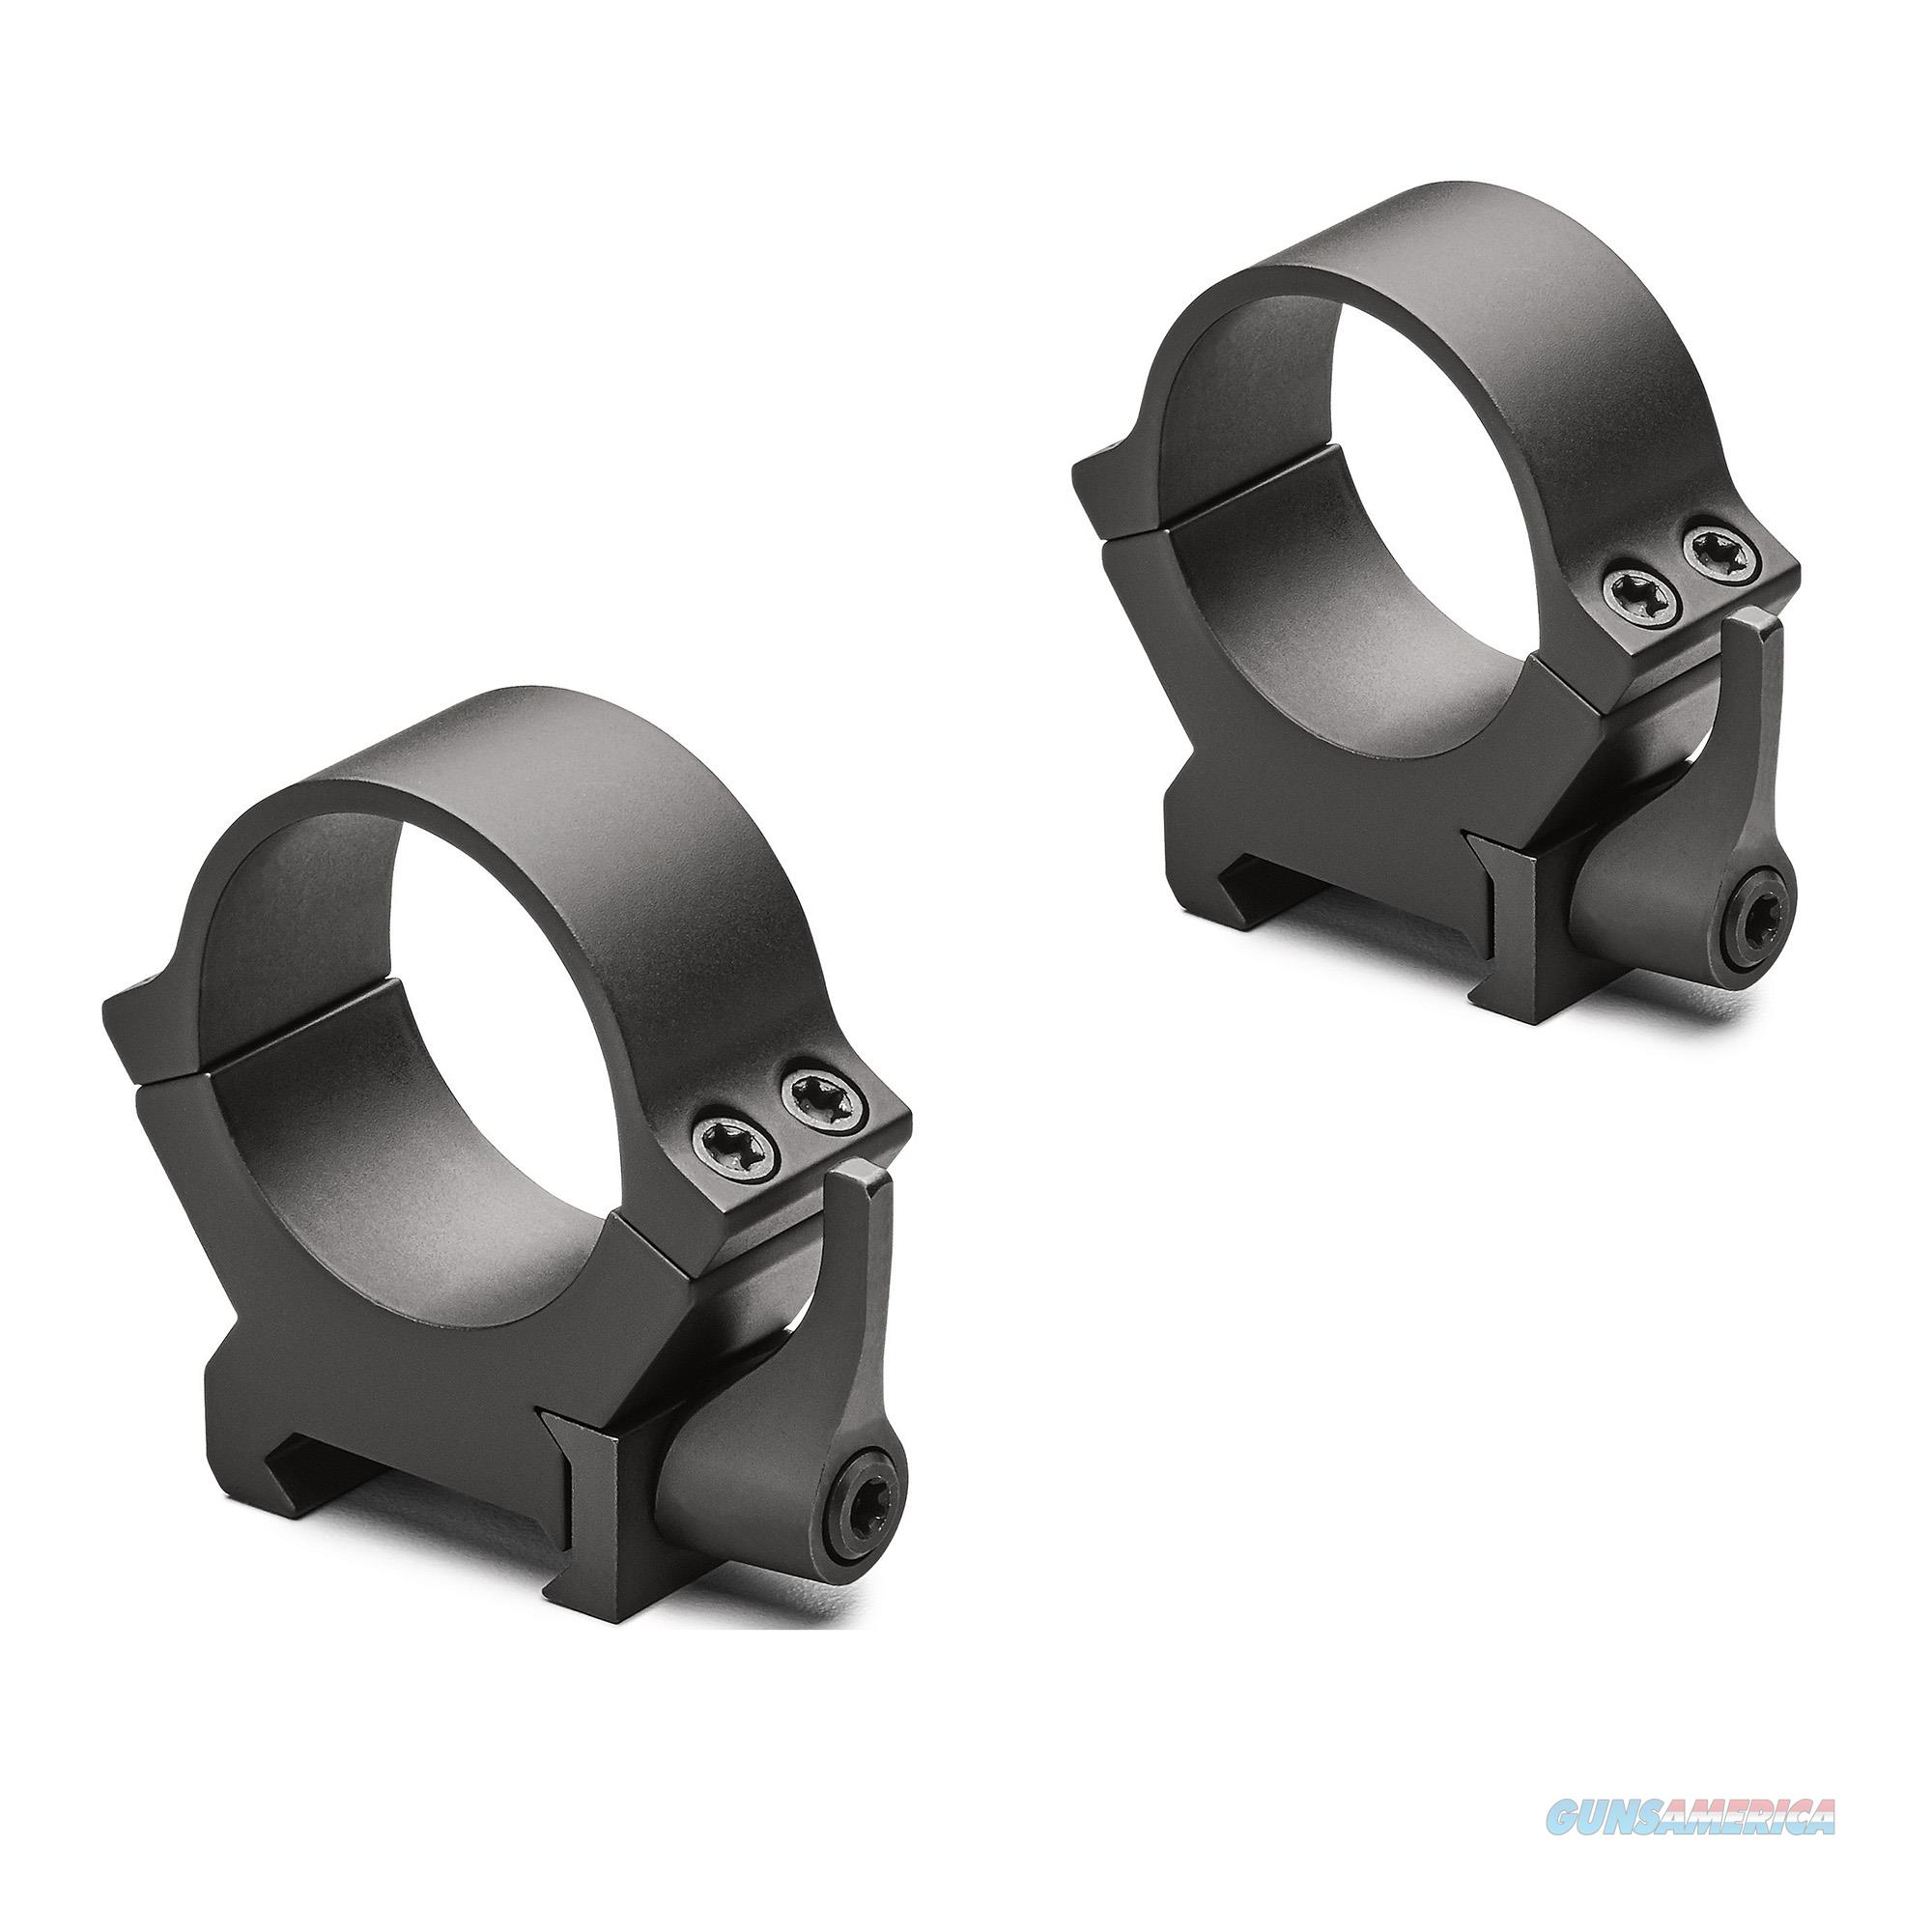 Leupold Rings Qrw2 30Mm High Gloss 174077  Non-Guns > Scopes/Mounts/Rings & Optics > Mounts > Other